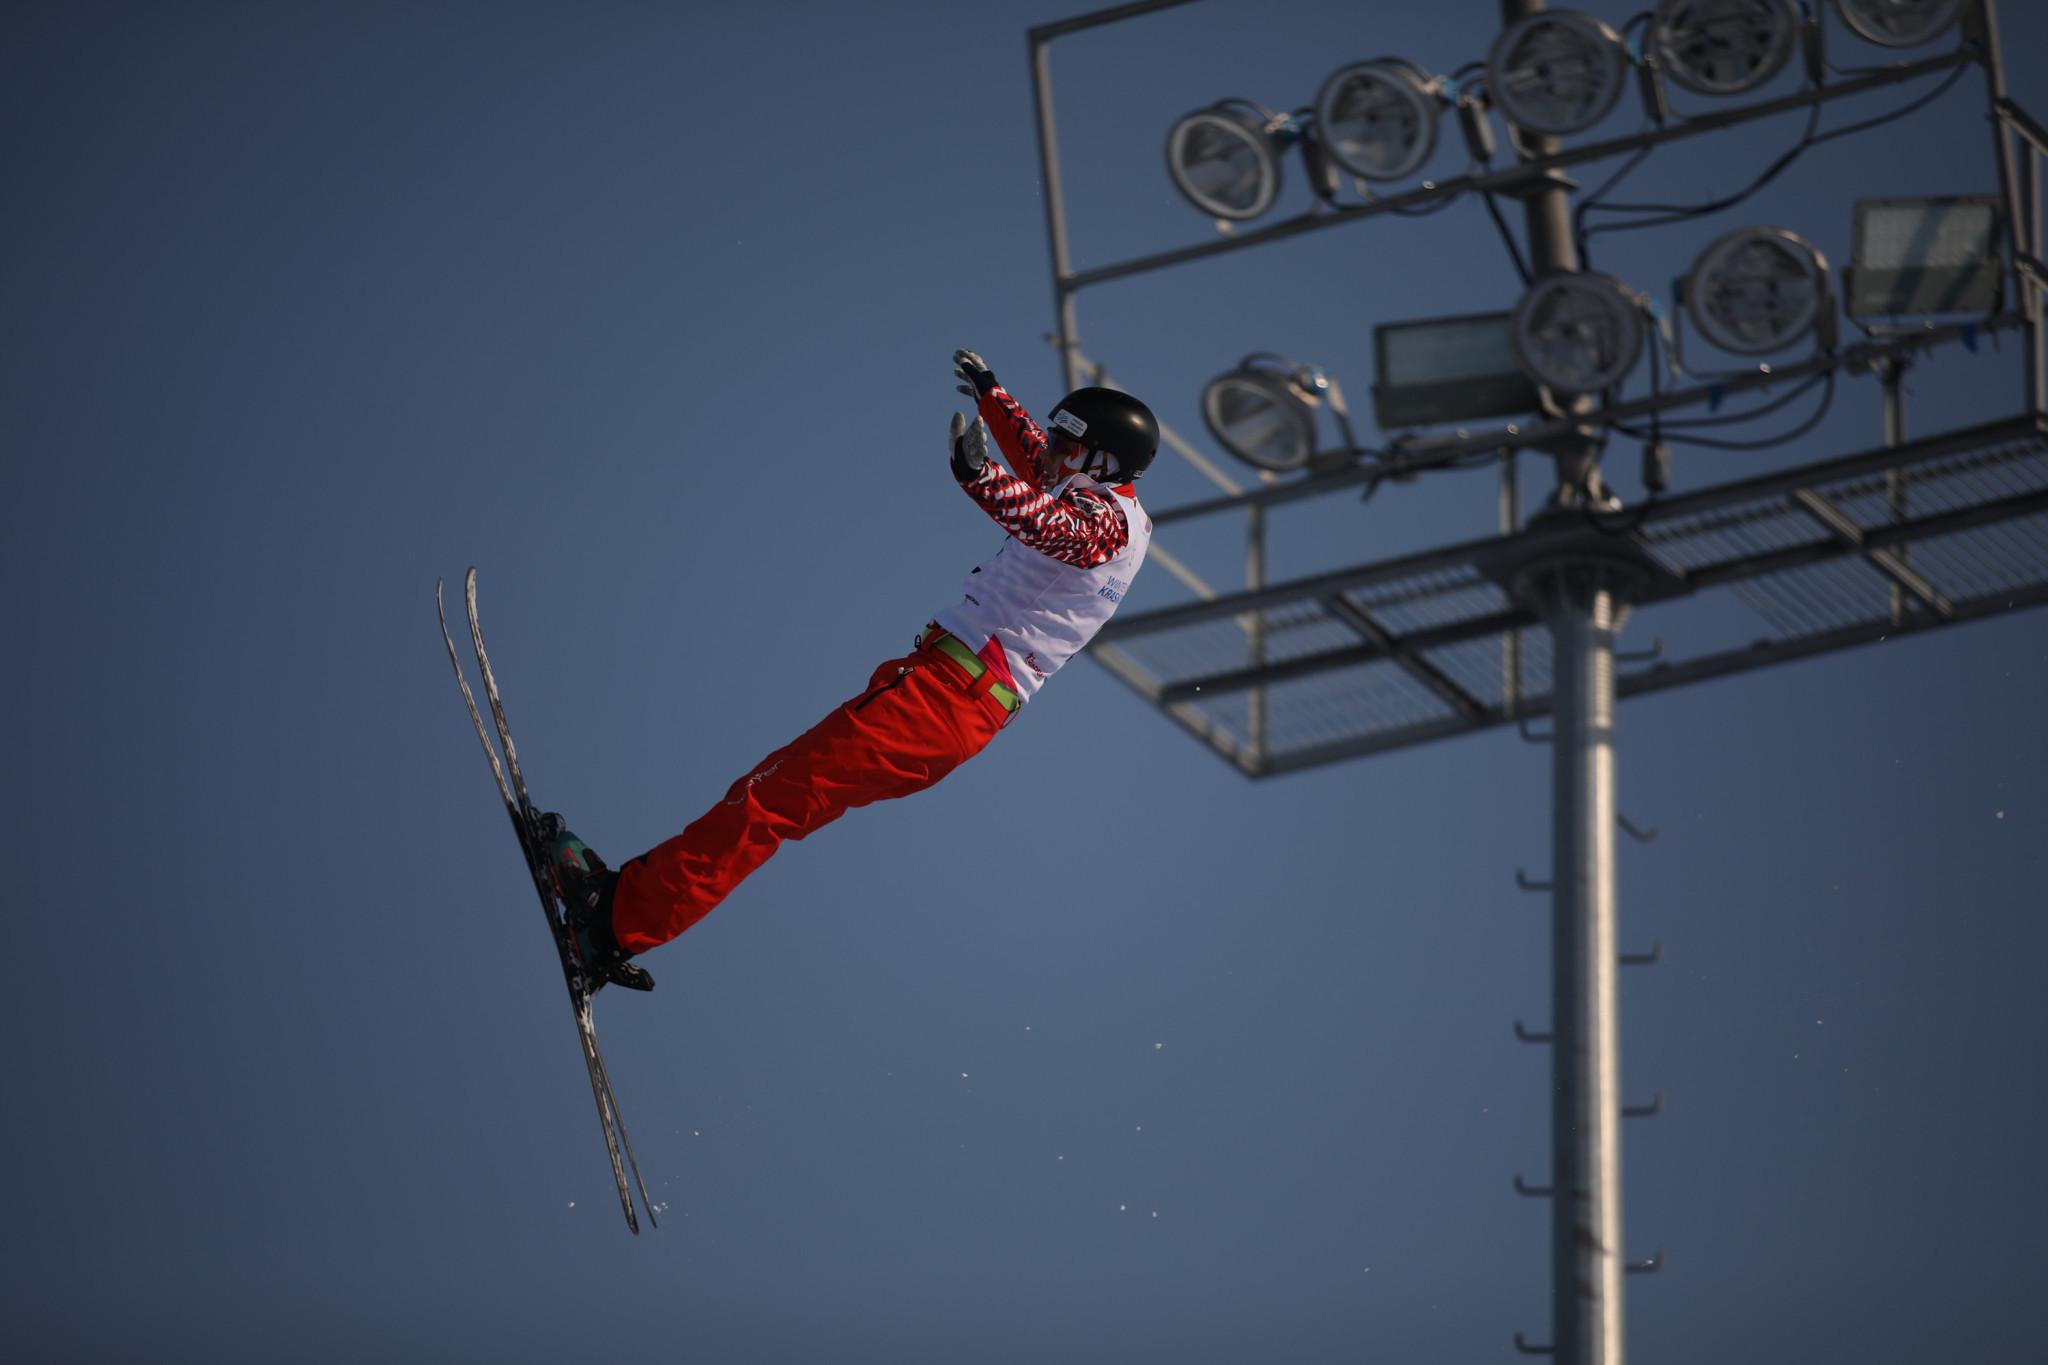 World champions take gold in freestyle skiing aerials at Krasnoyarsk 2019 Winter Universiade